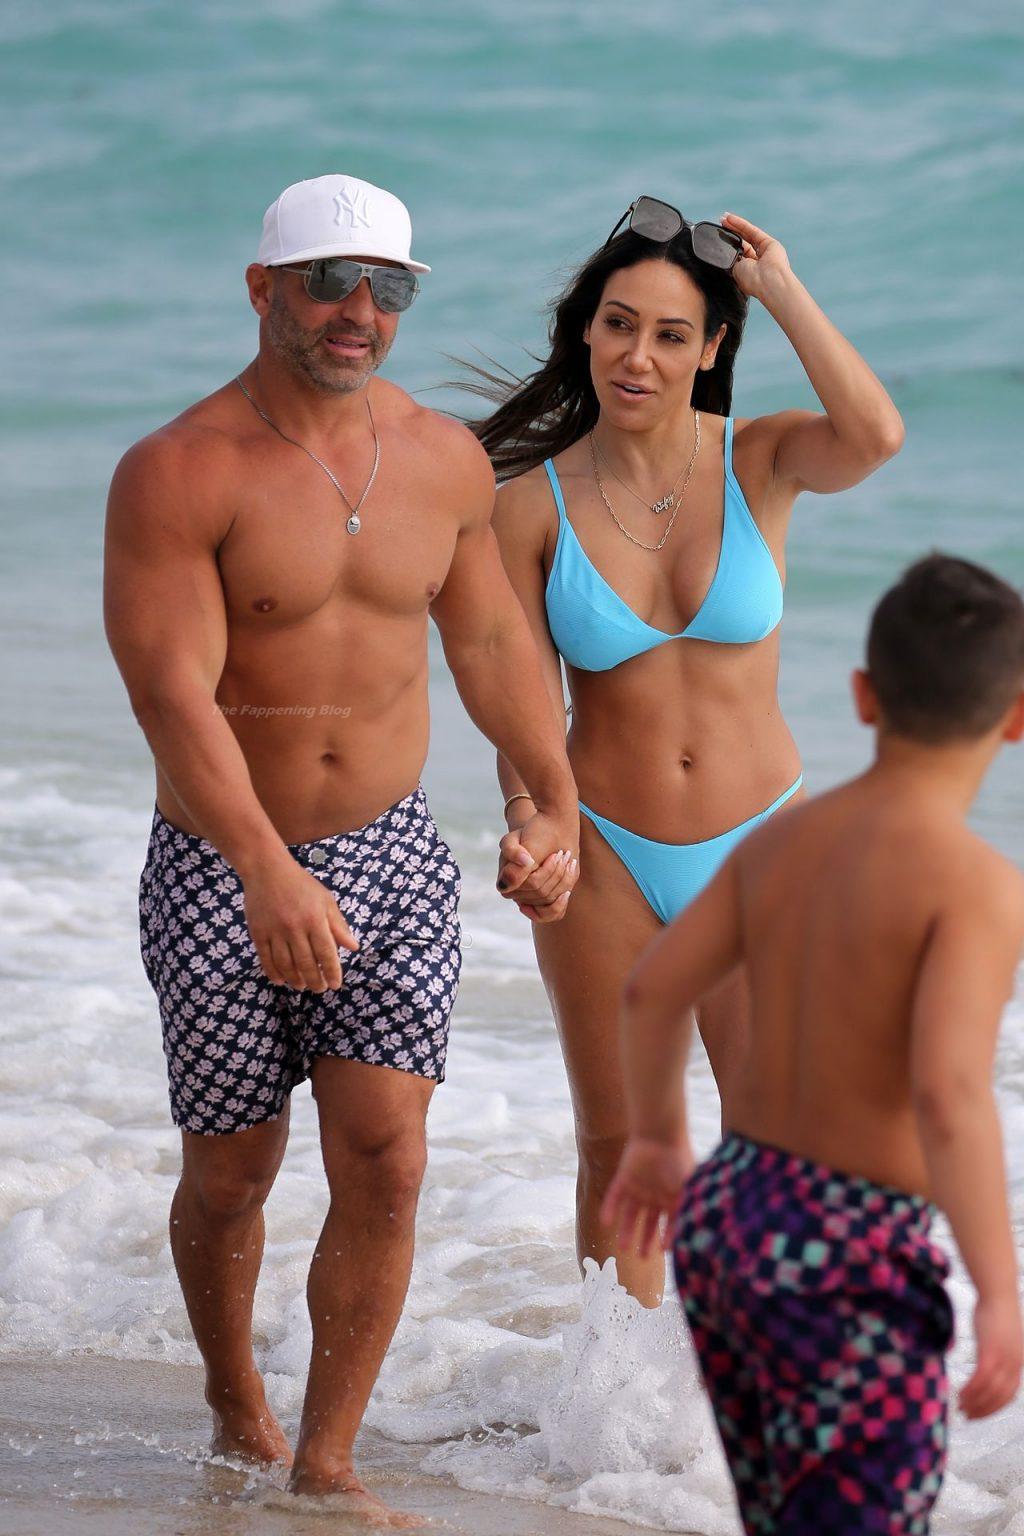 Melissa Gorga Looks Amazing in a Bikini on the Beach in Miami (141 Photos)